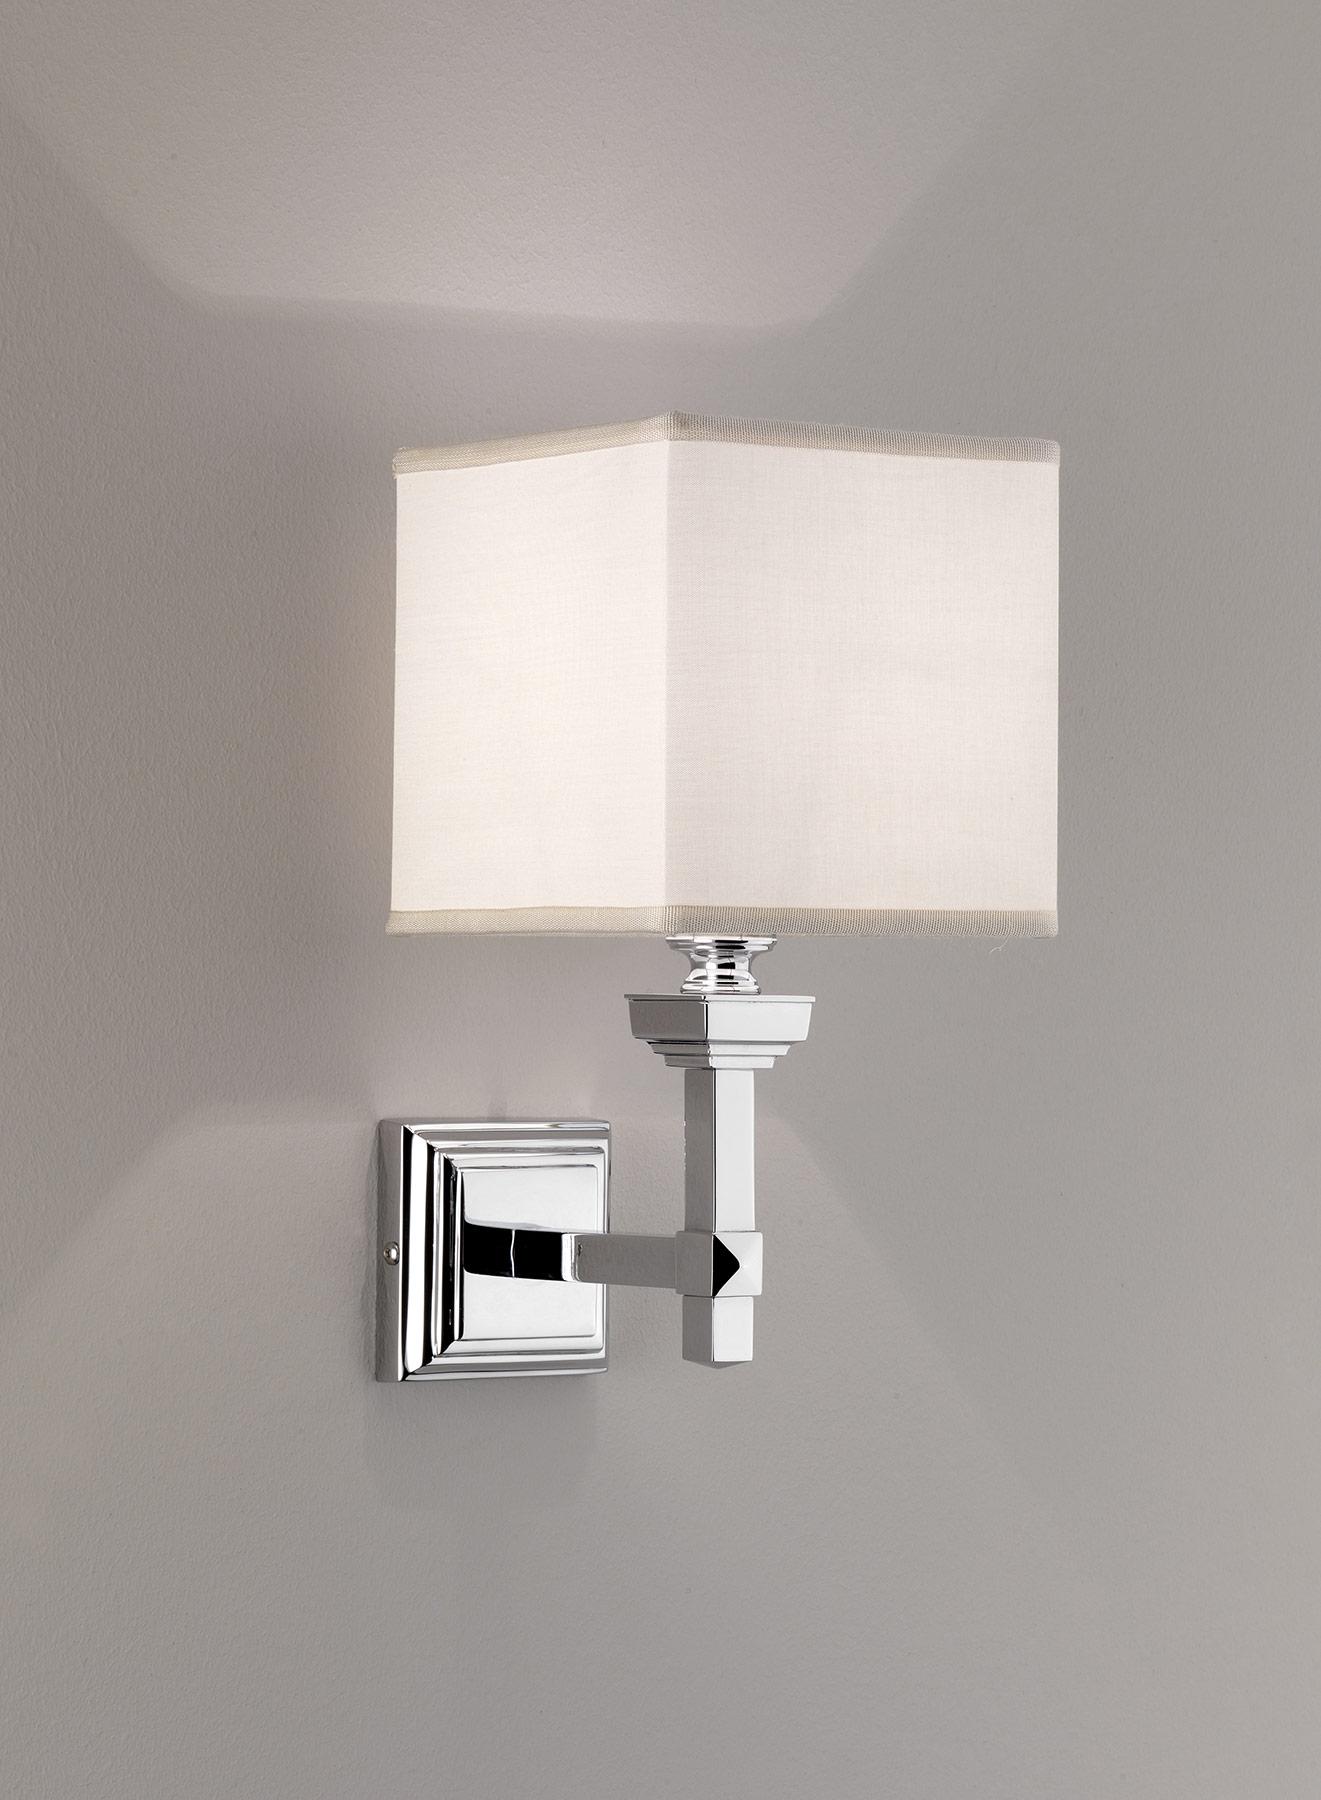 Modern Time Wall Mount Lamp